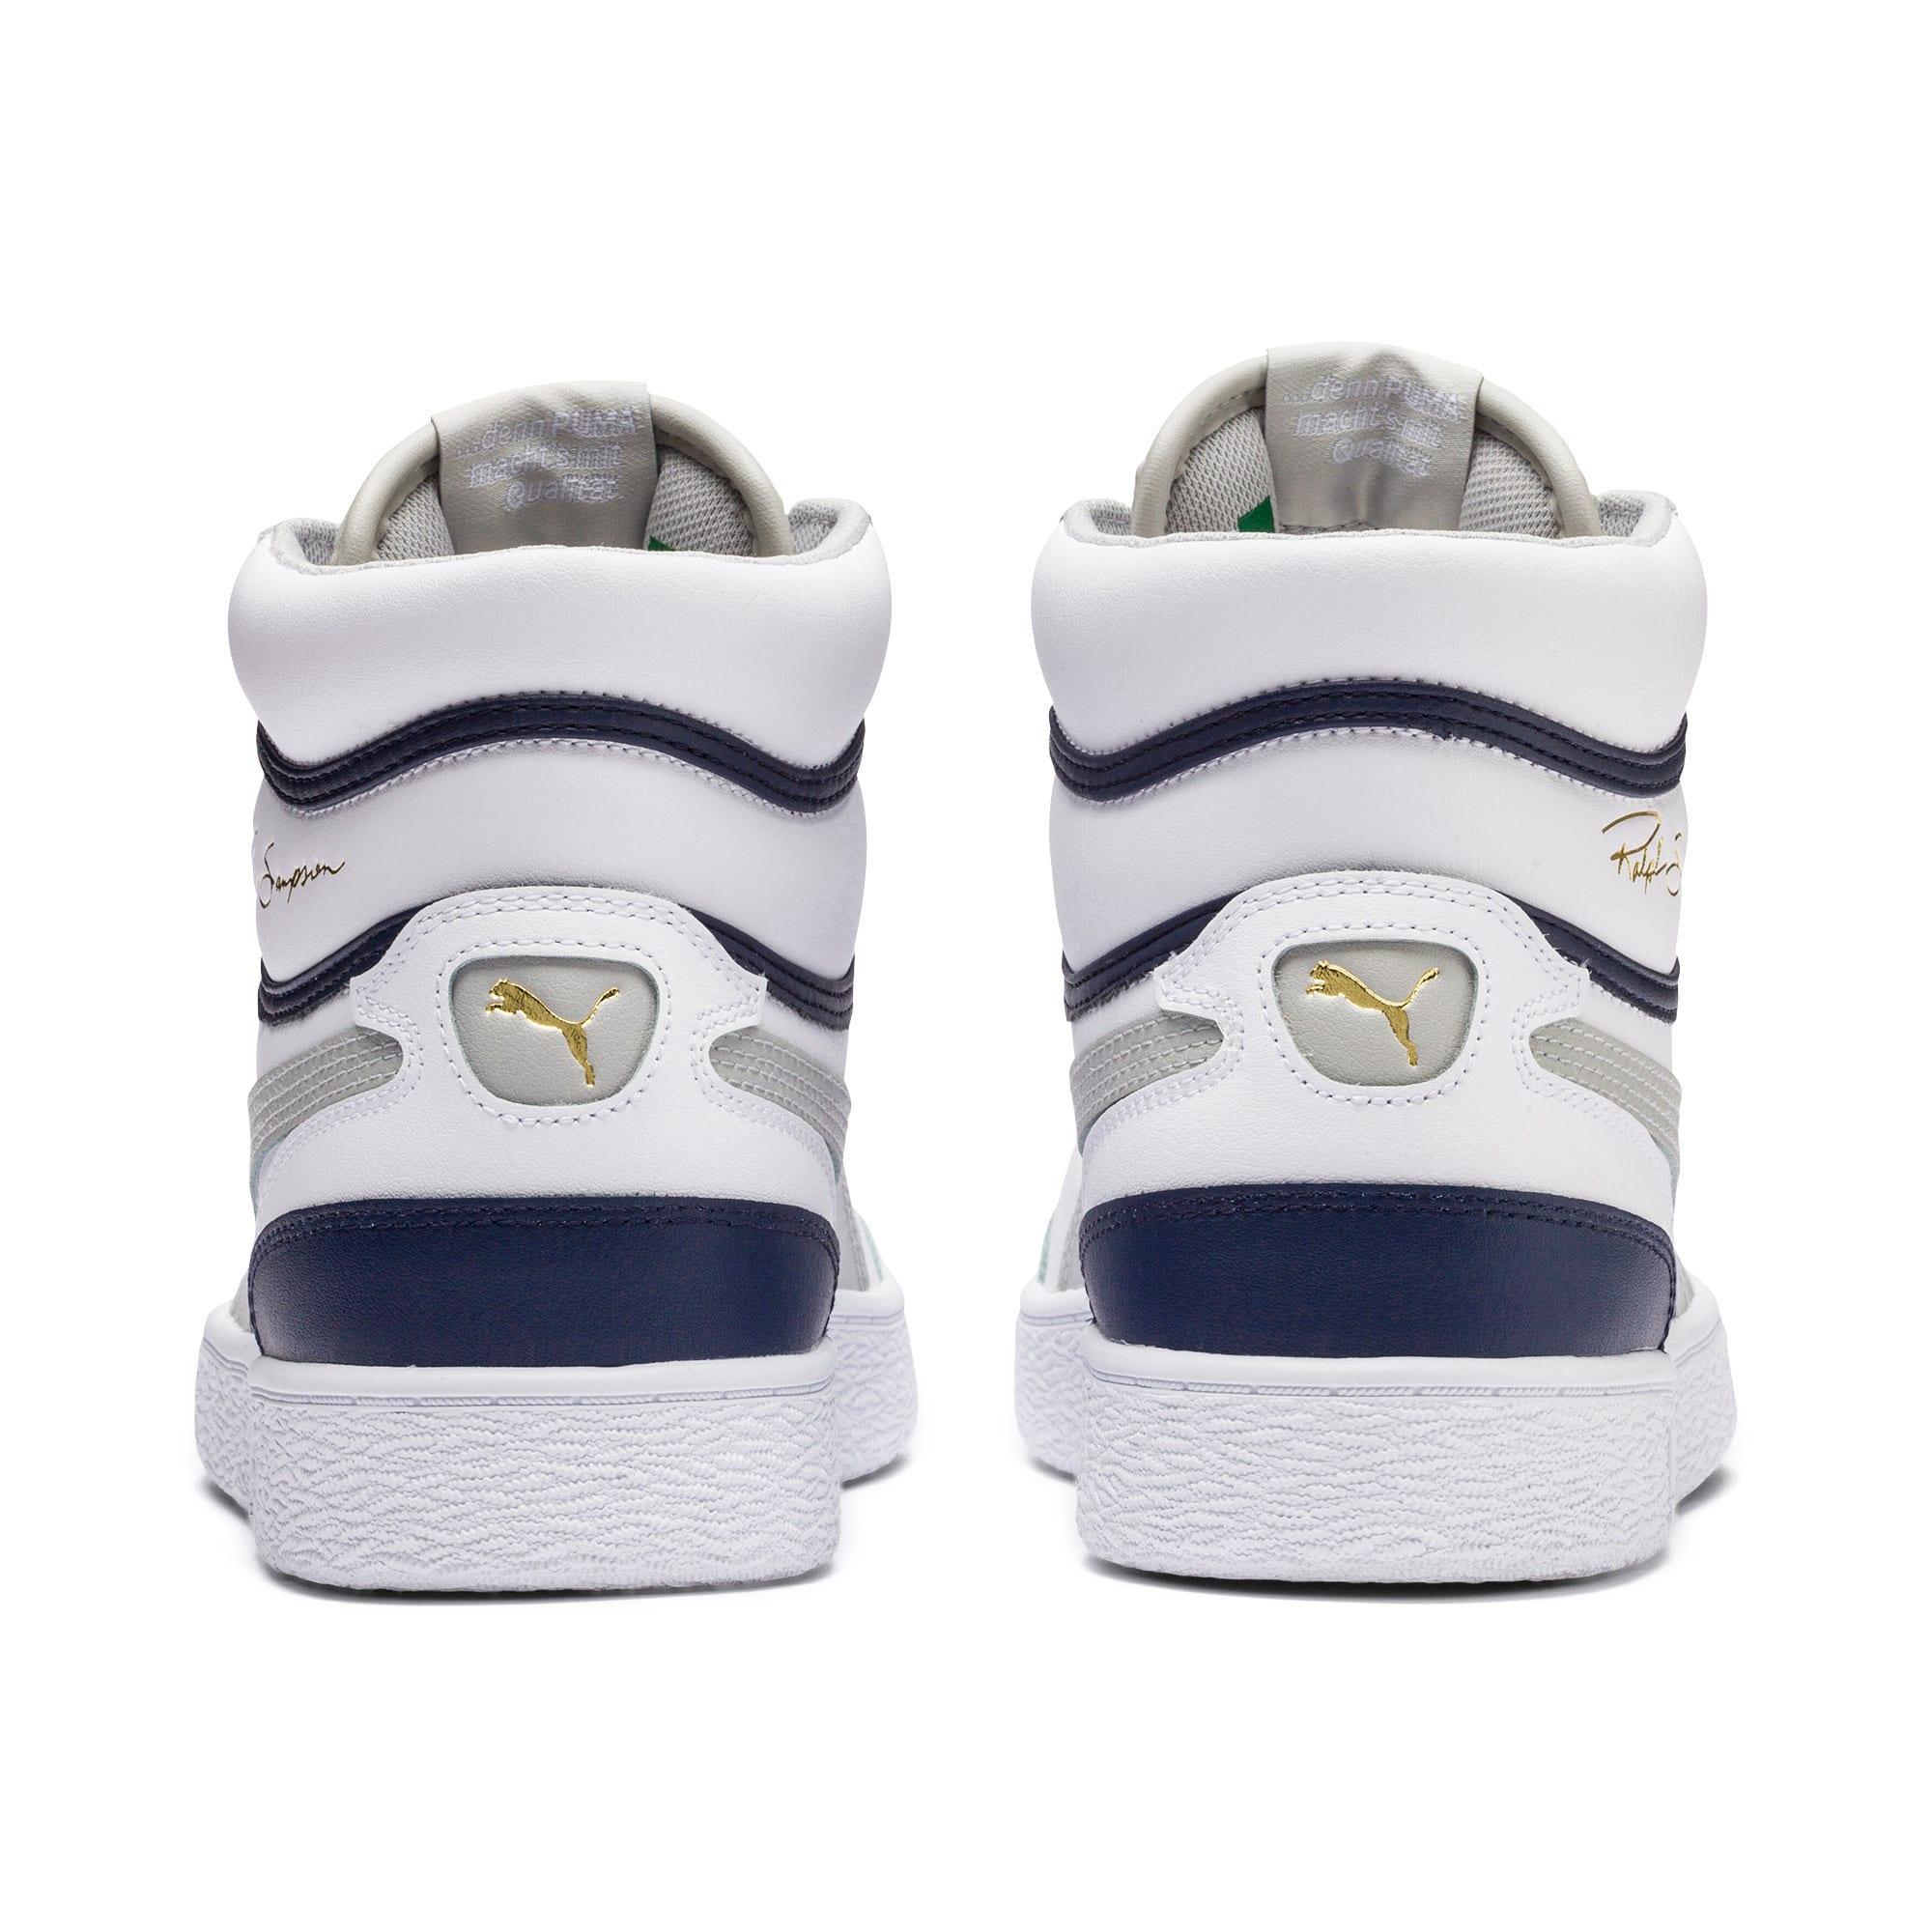 Thumbnail 3 of Ralph Sampson Mid Sneakers, P White-Gray Violet-Peacoat, medium